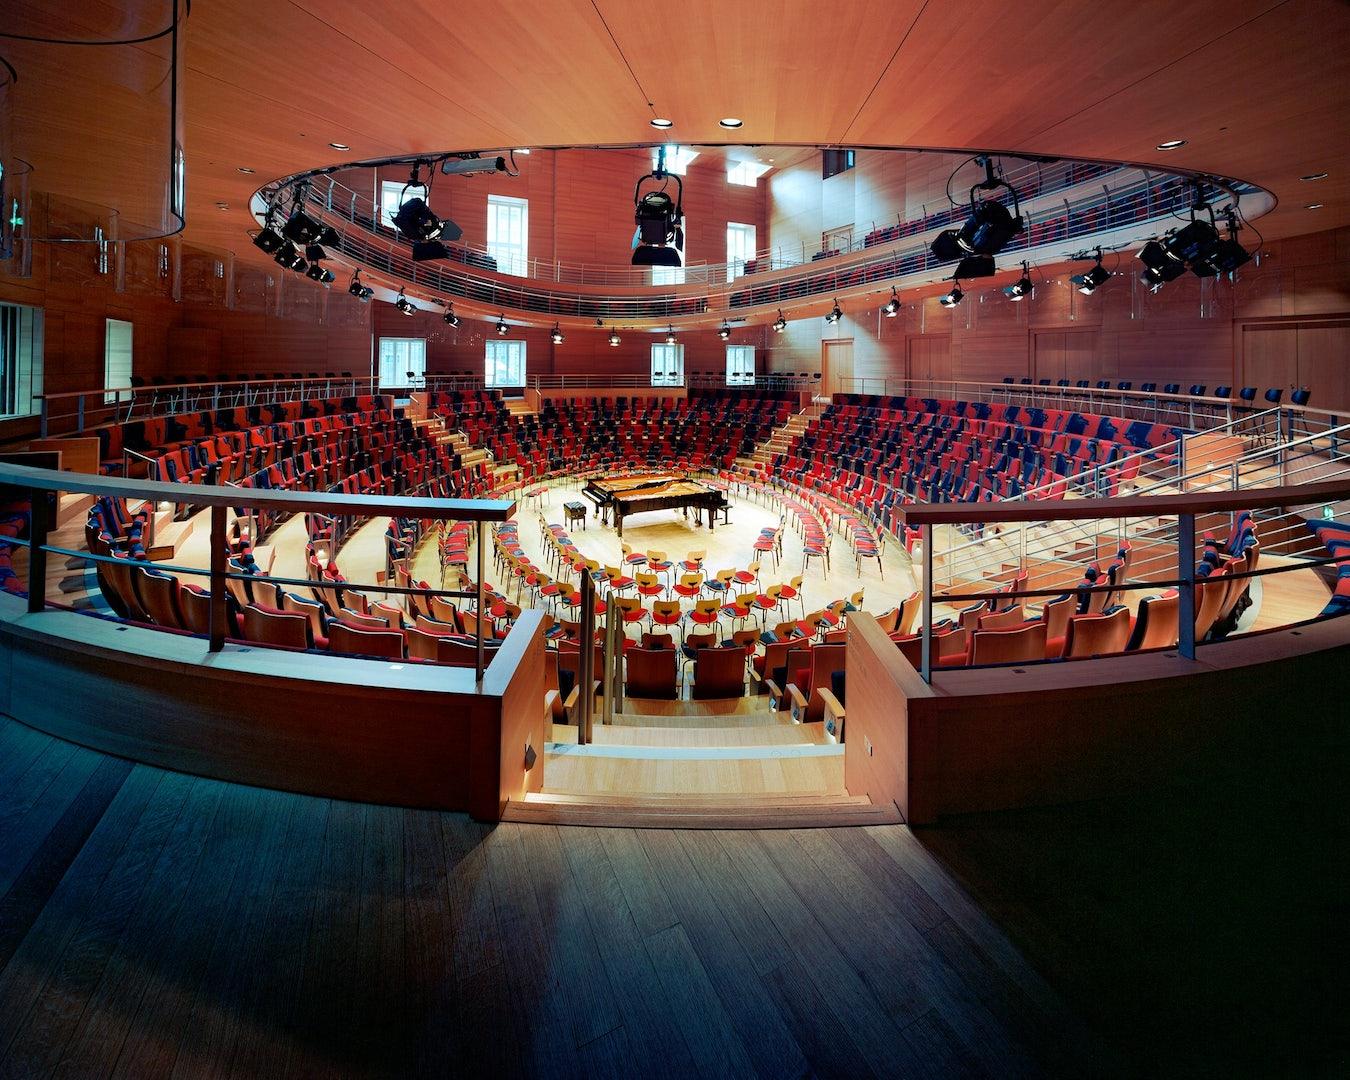 the Pierre Boulez Saal Concert Hall